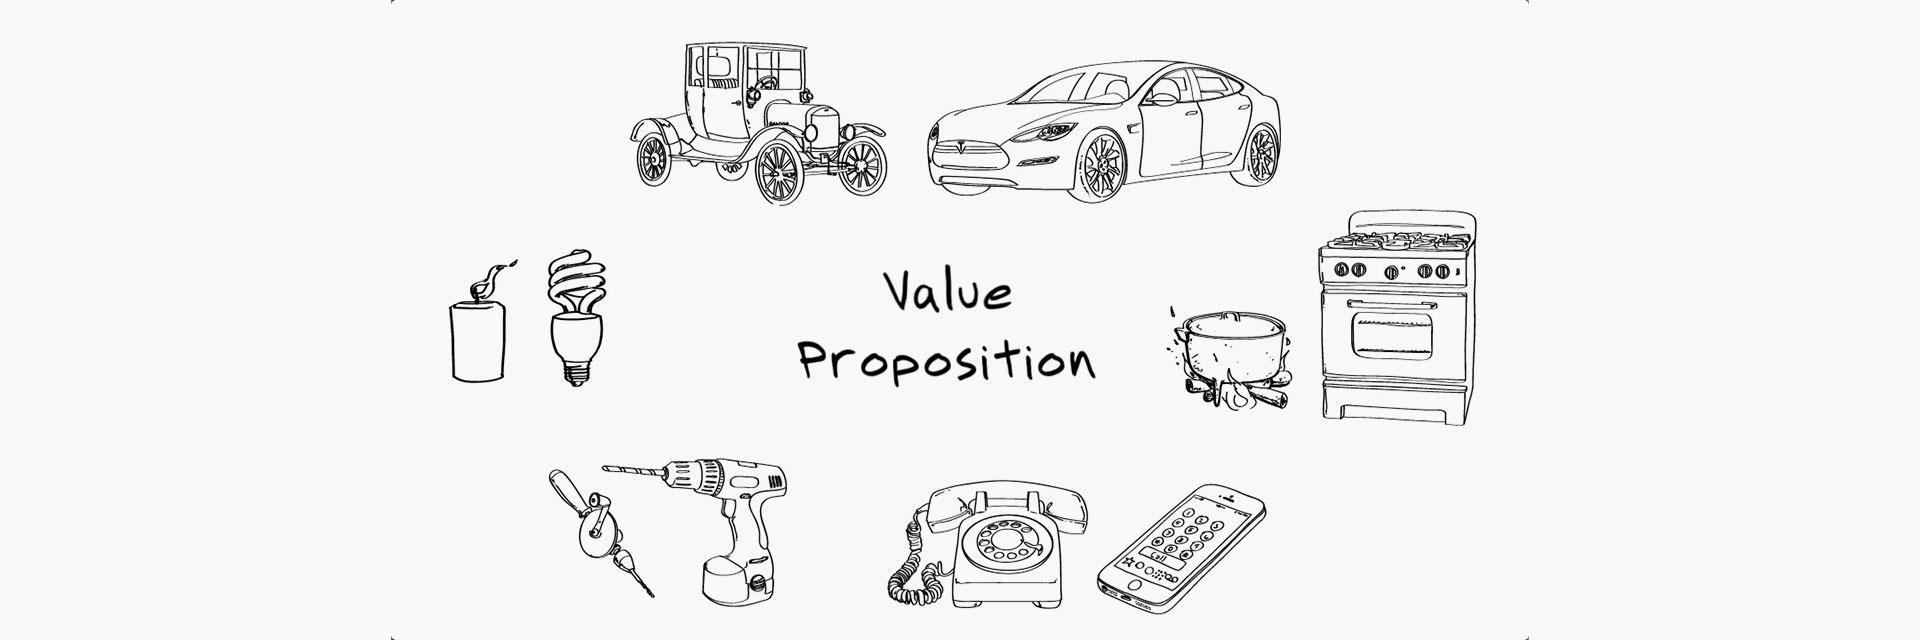 外贸开发信视频:什么是价值主张Value Proposition?